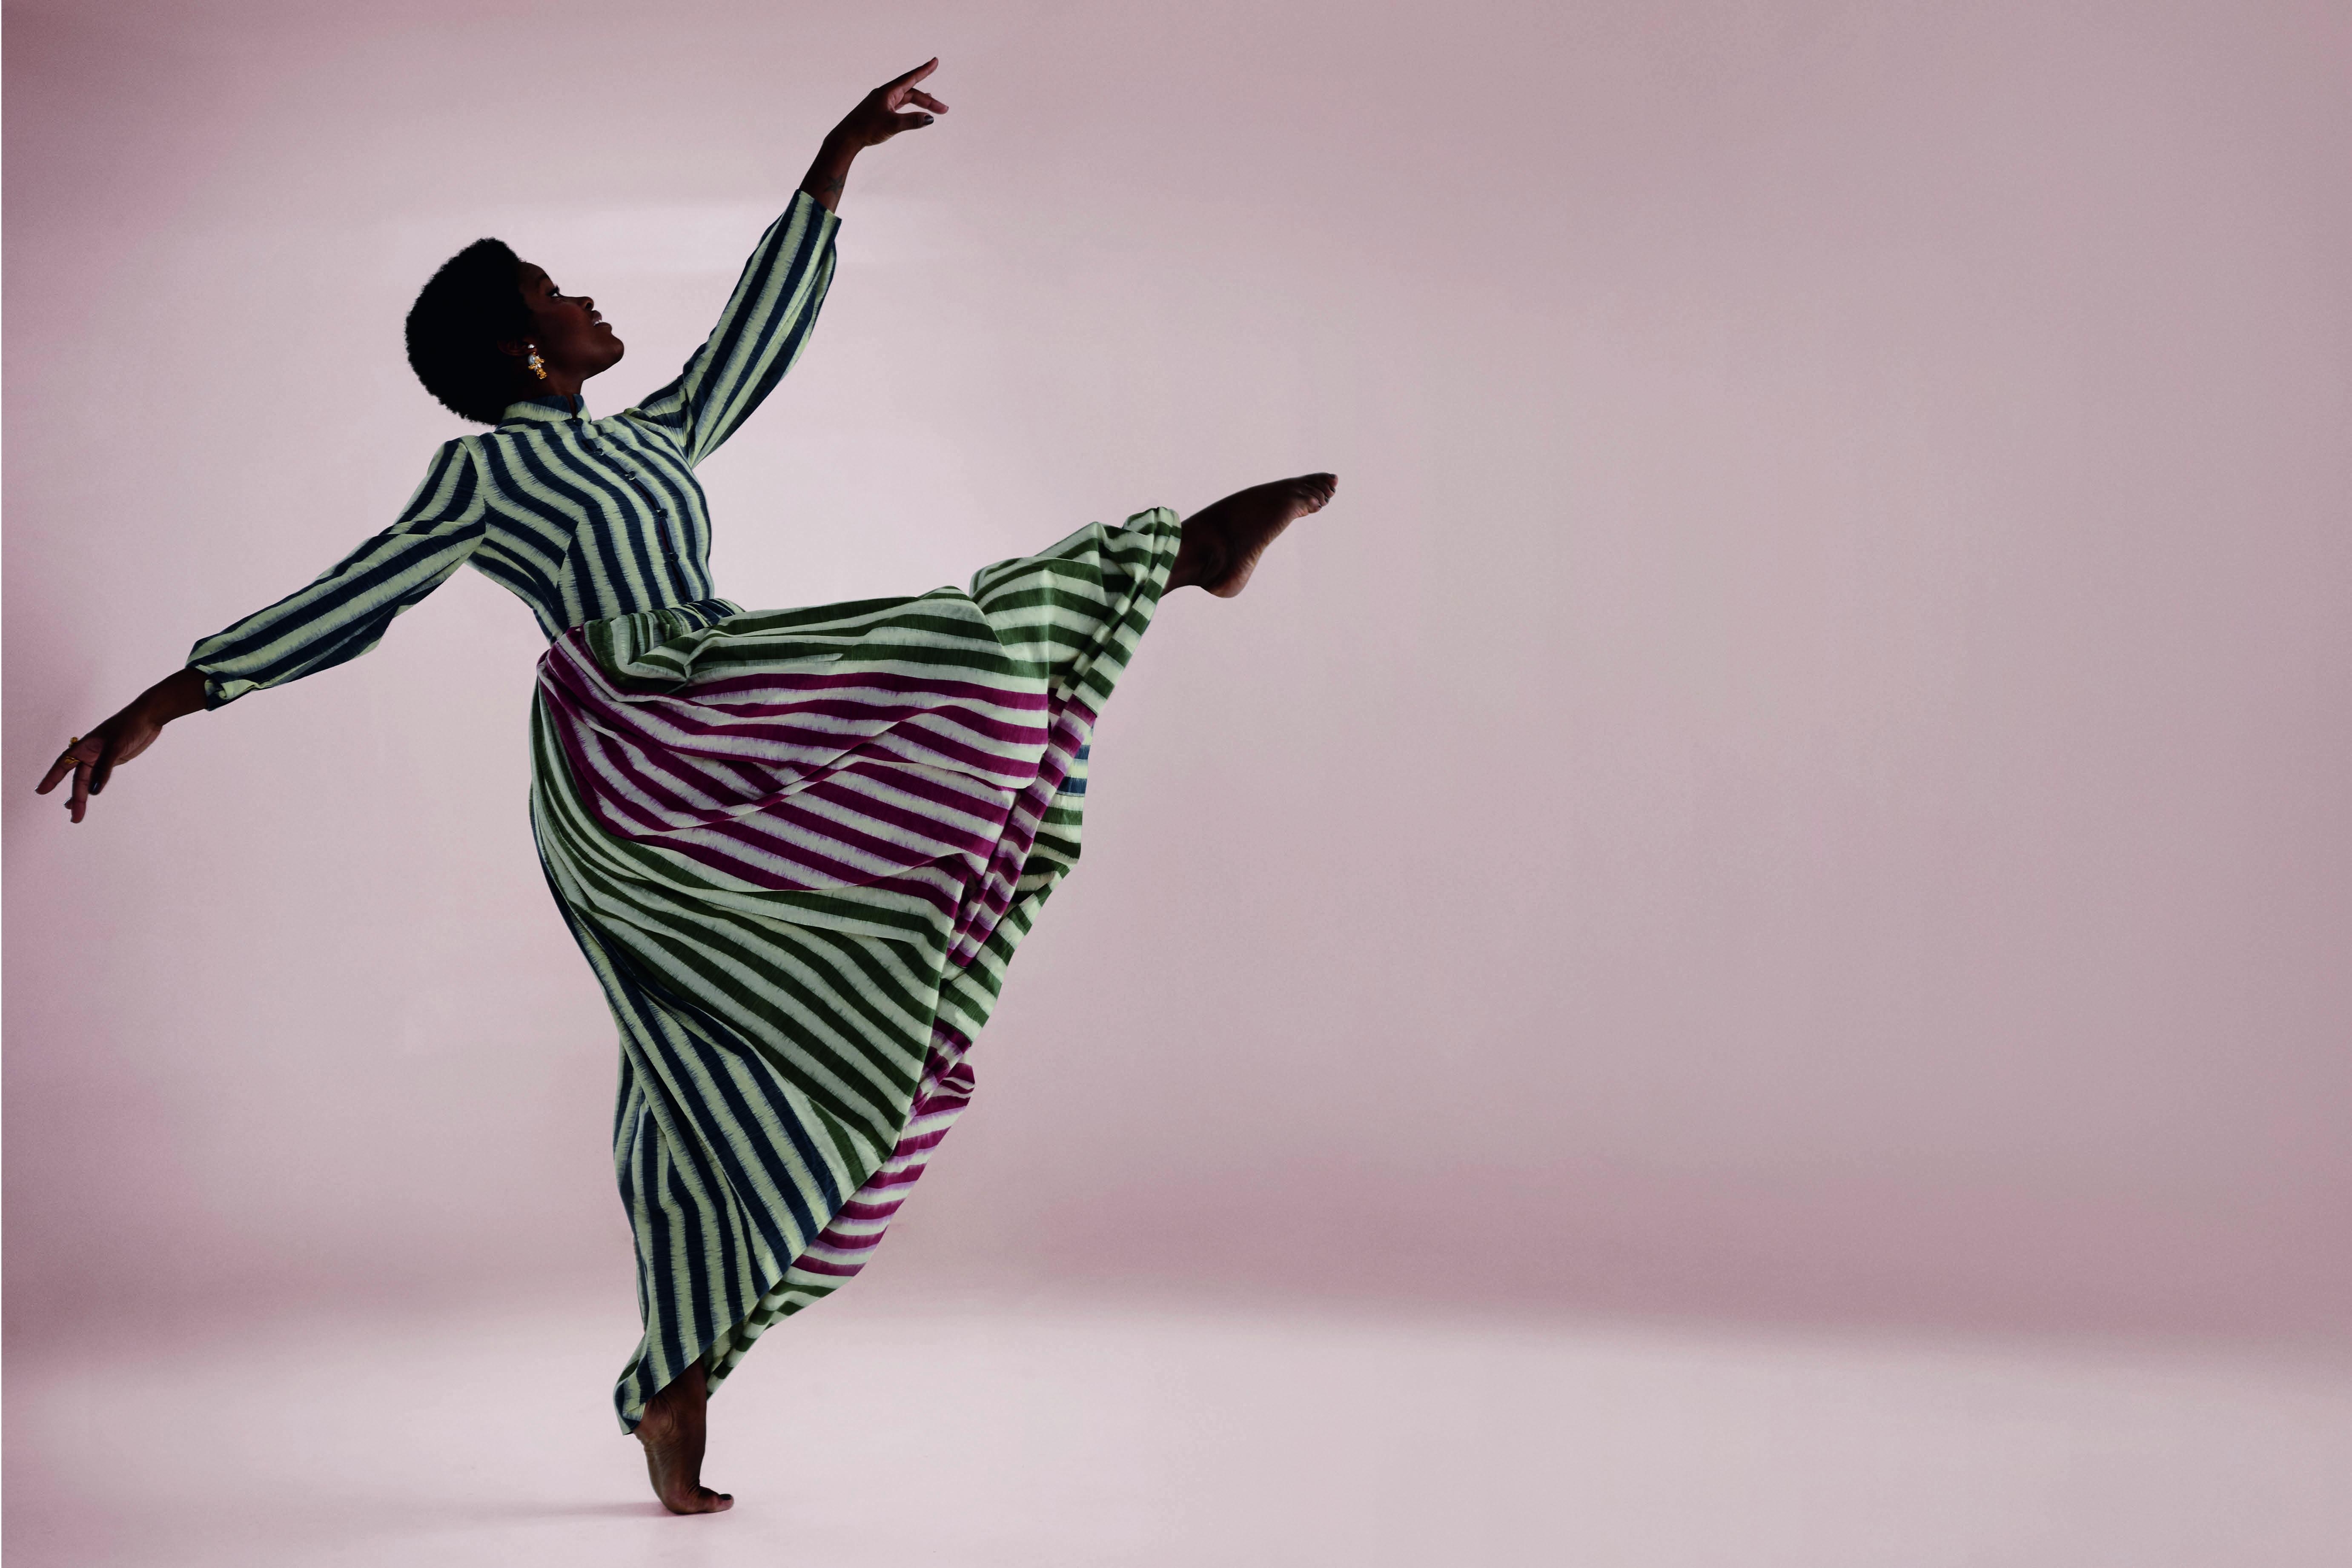 Ingrid dança